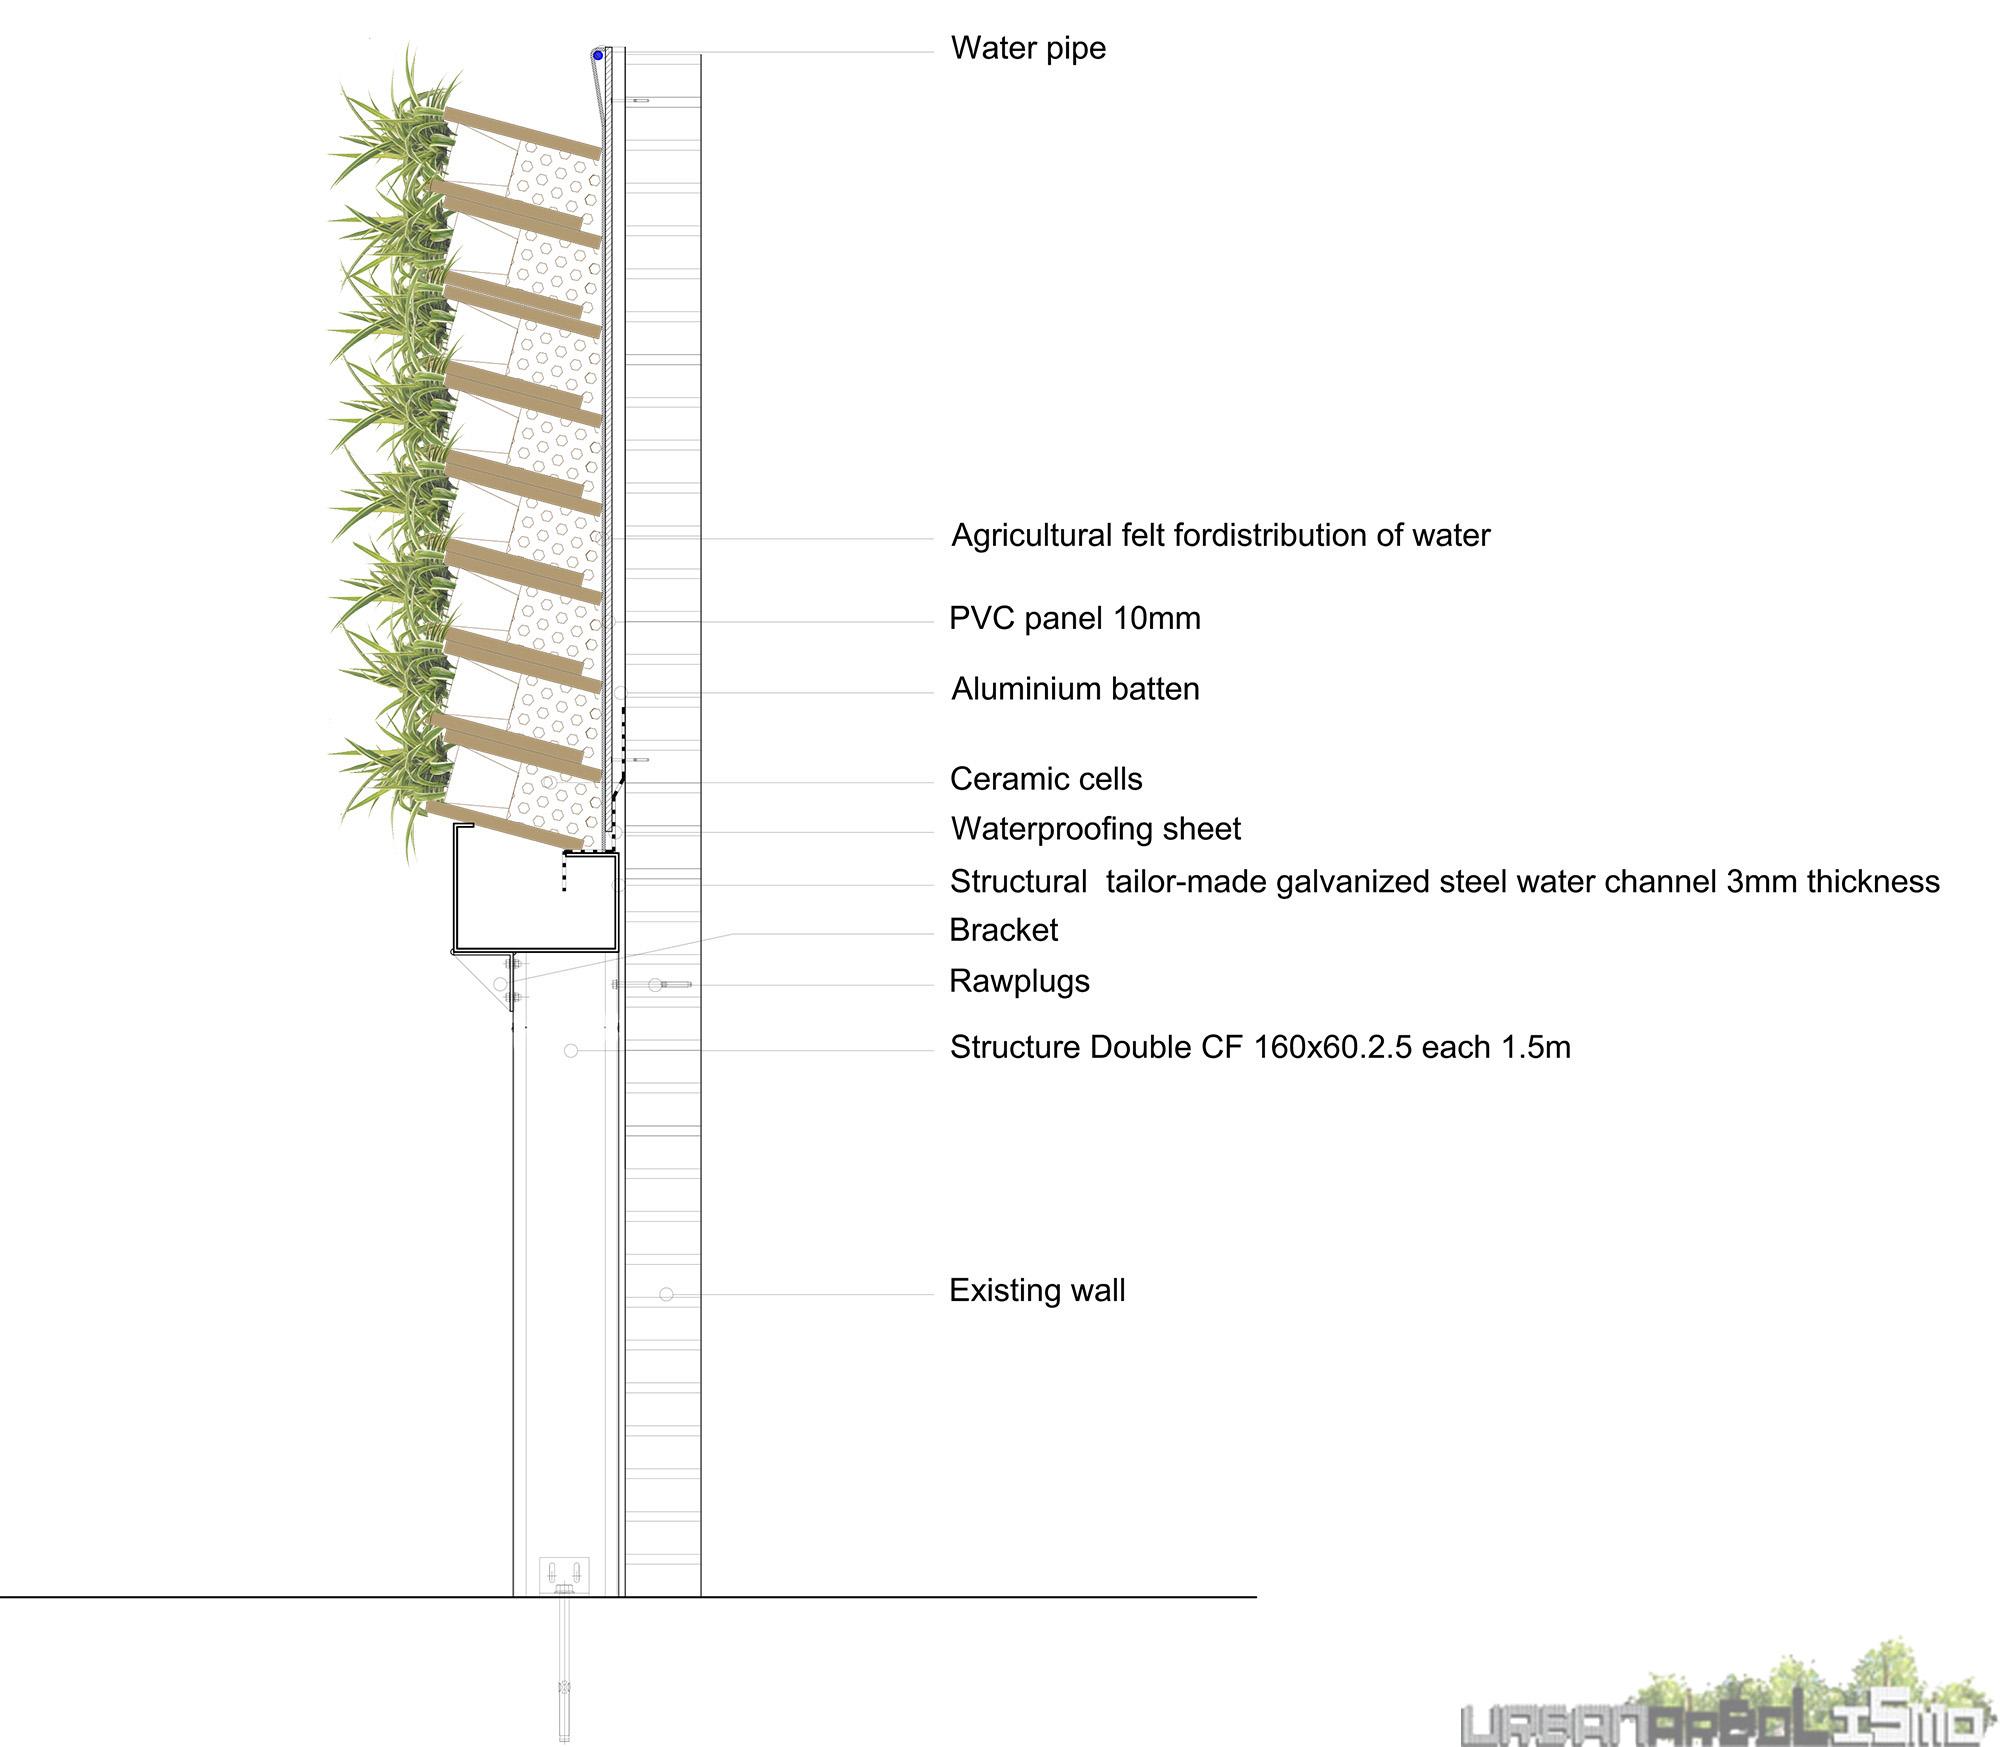 Jard n vertical interior con sistema eco bin mixto for Sistema de riego vertical